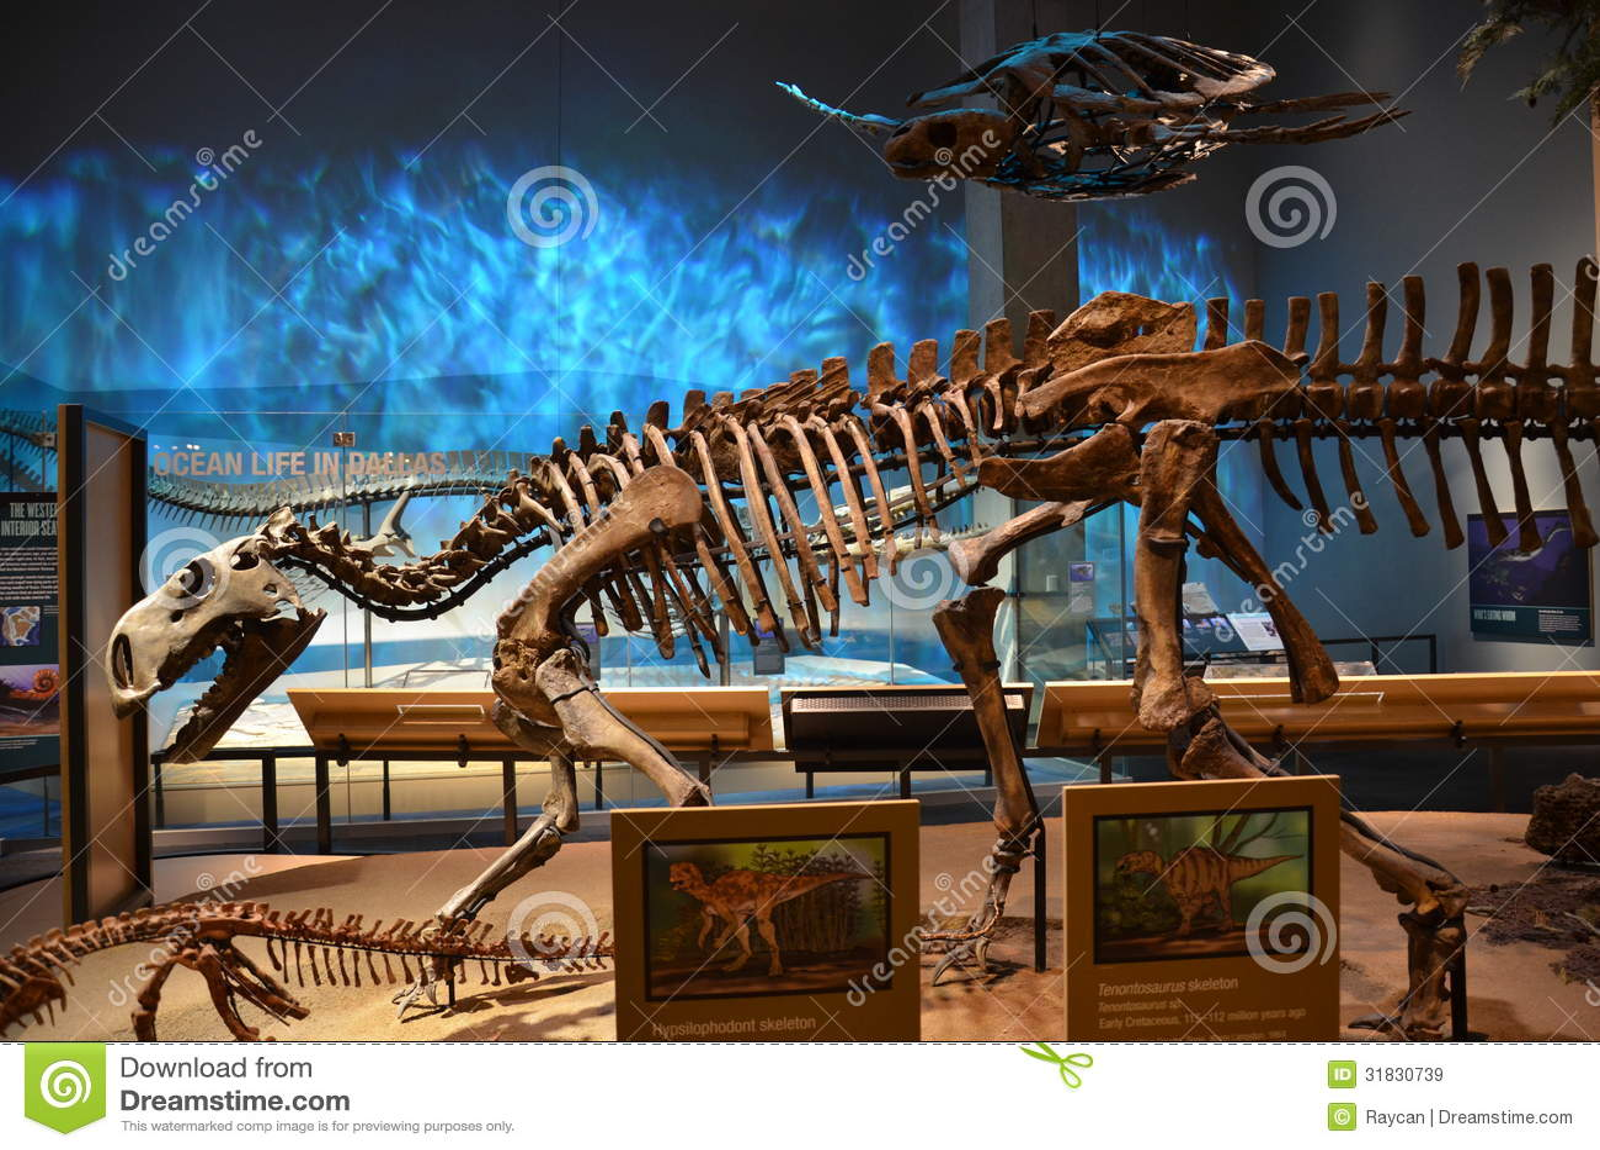 Perot Museum Fossils Perot Museum Fossils editorial